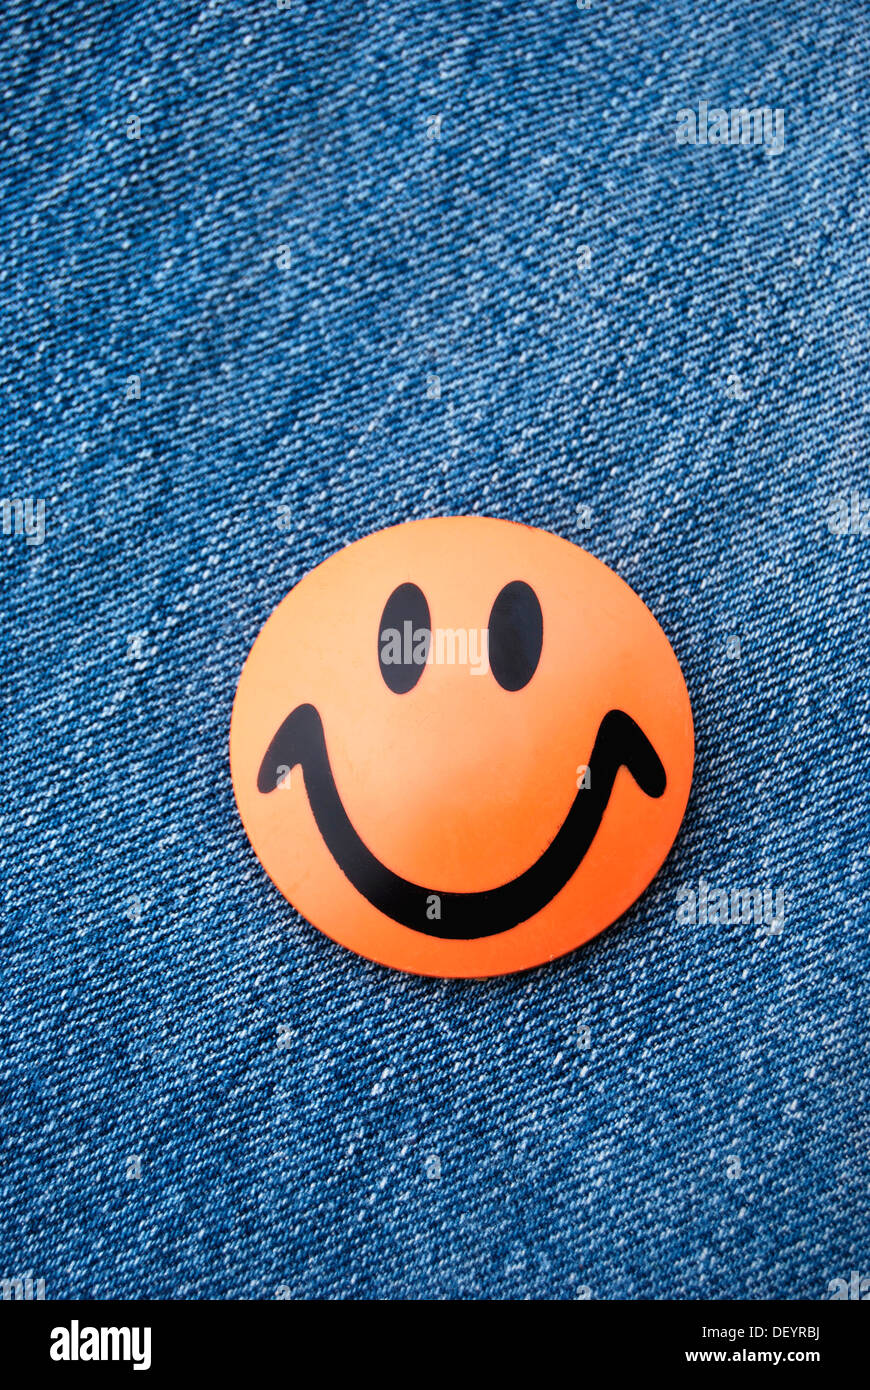 Smiley, kitchen magnets, orange, jeans, good mood - Stock Image